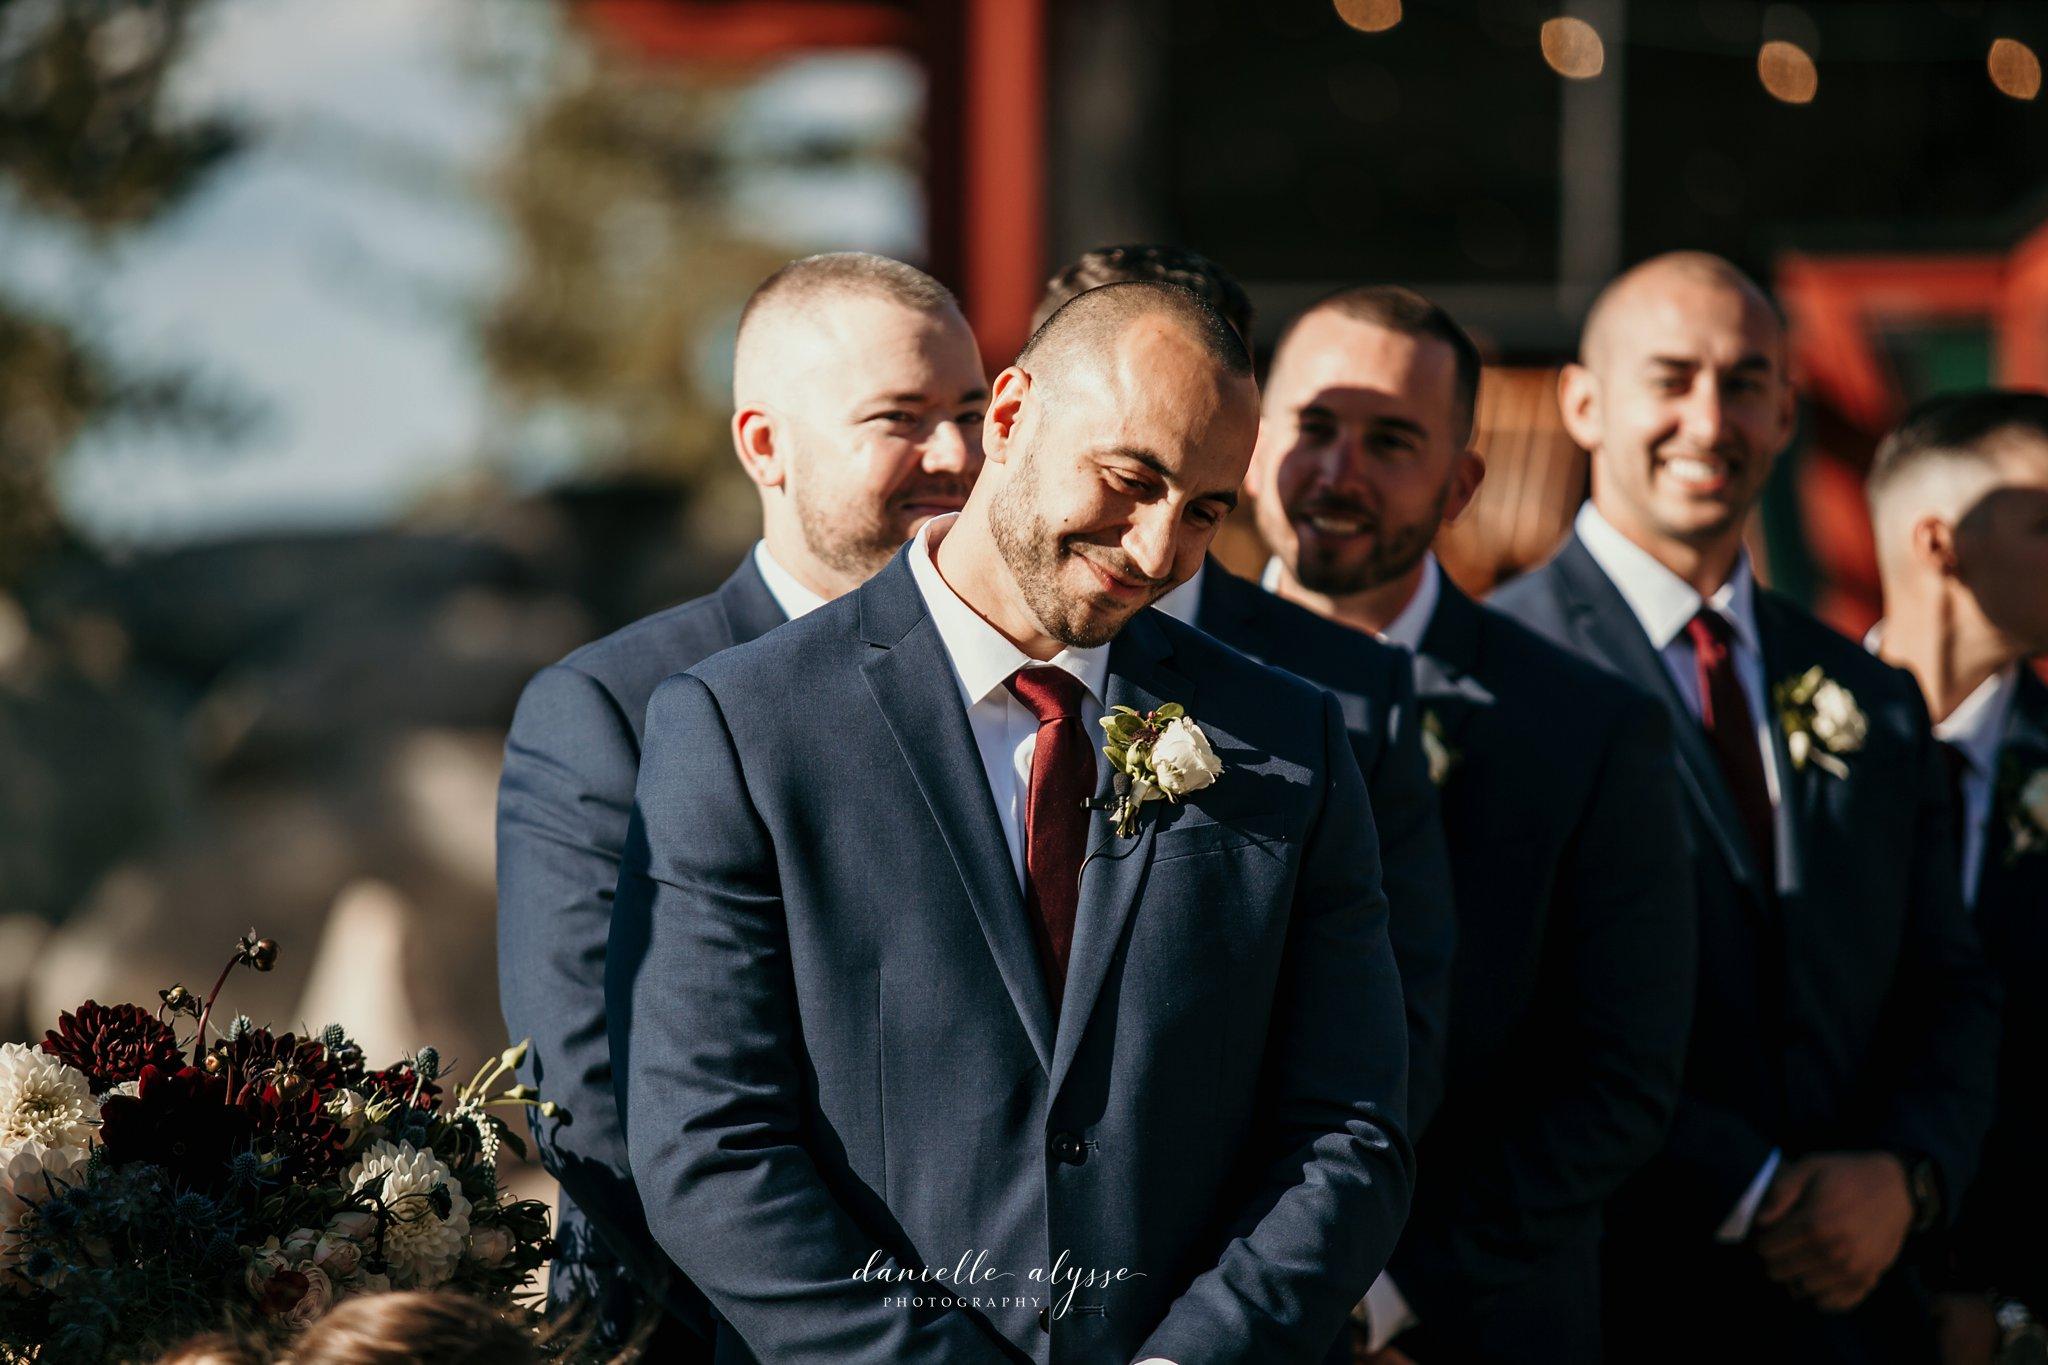 180831_wedding_stephanie_heavenly_south_lake_tahoe_danielle_alysse_photography_destination_blog_635_WEB.jpg